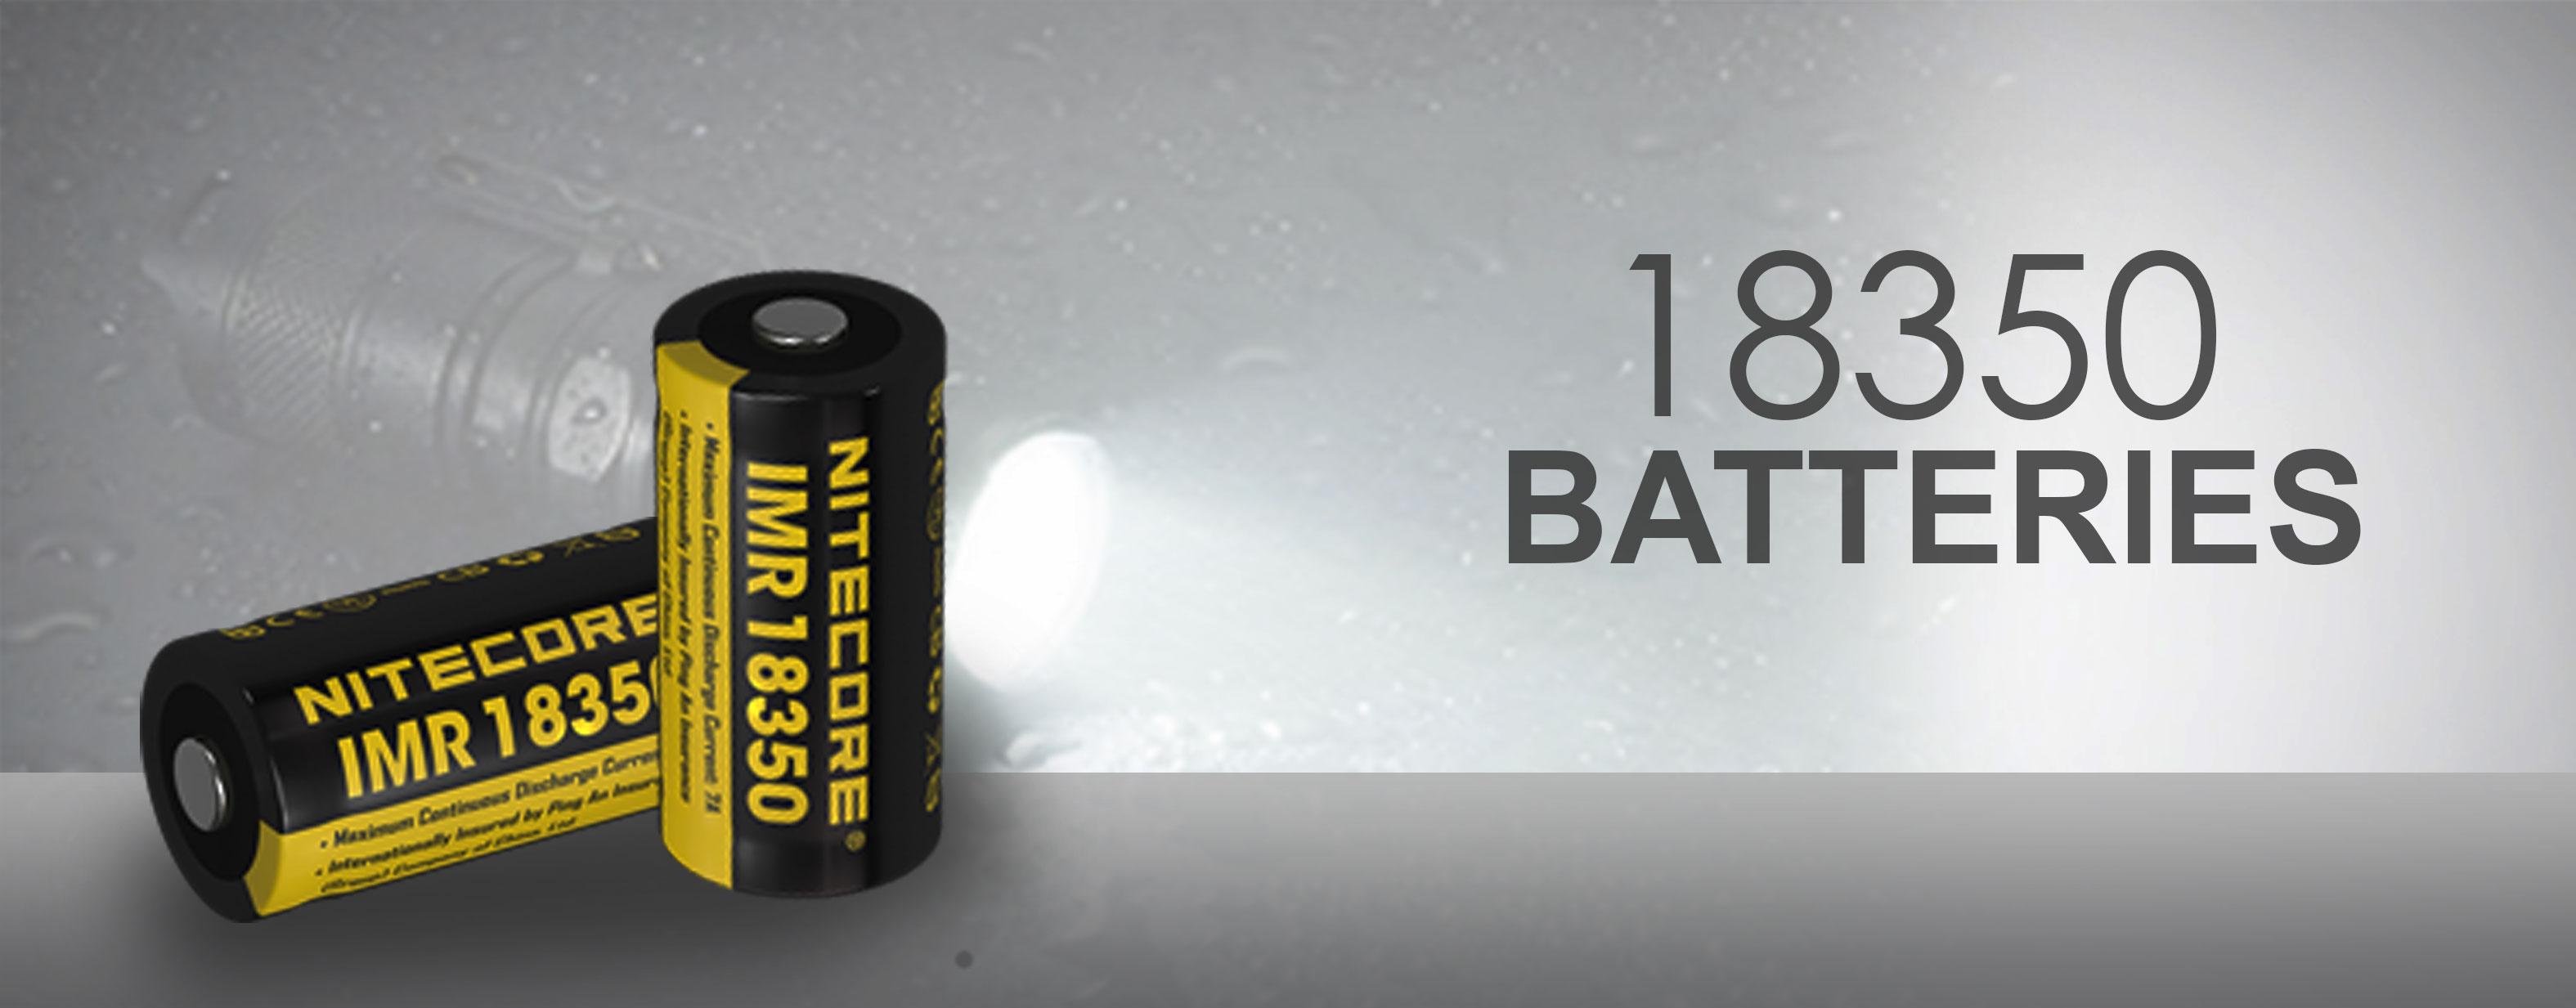 18350 Batteries